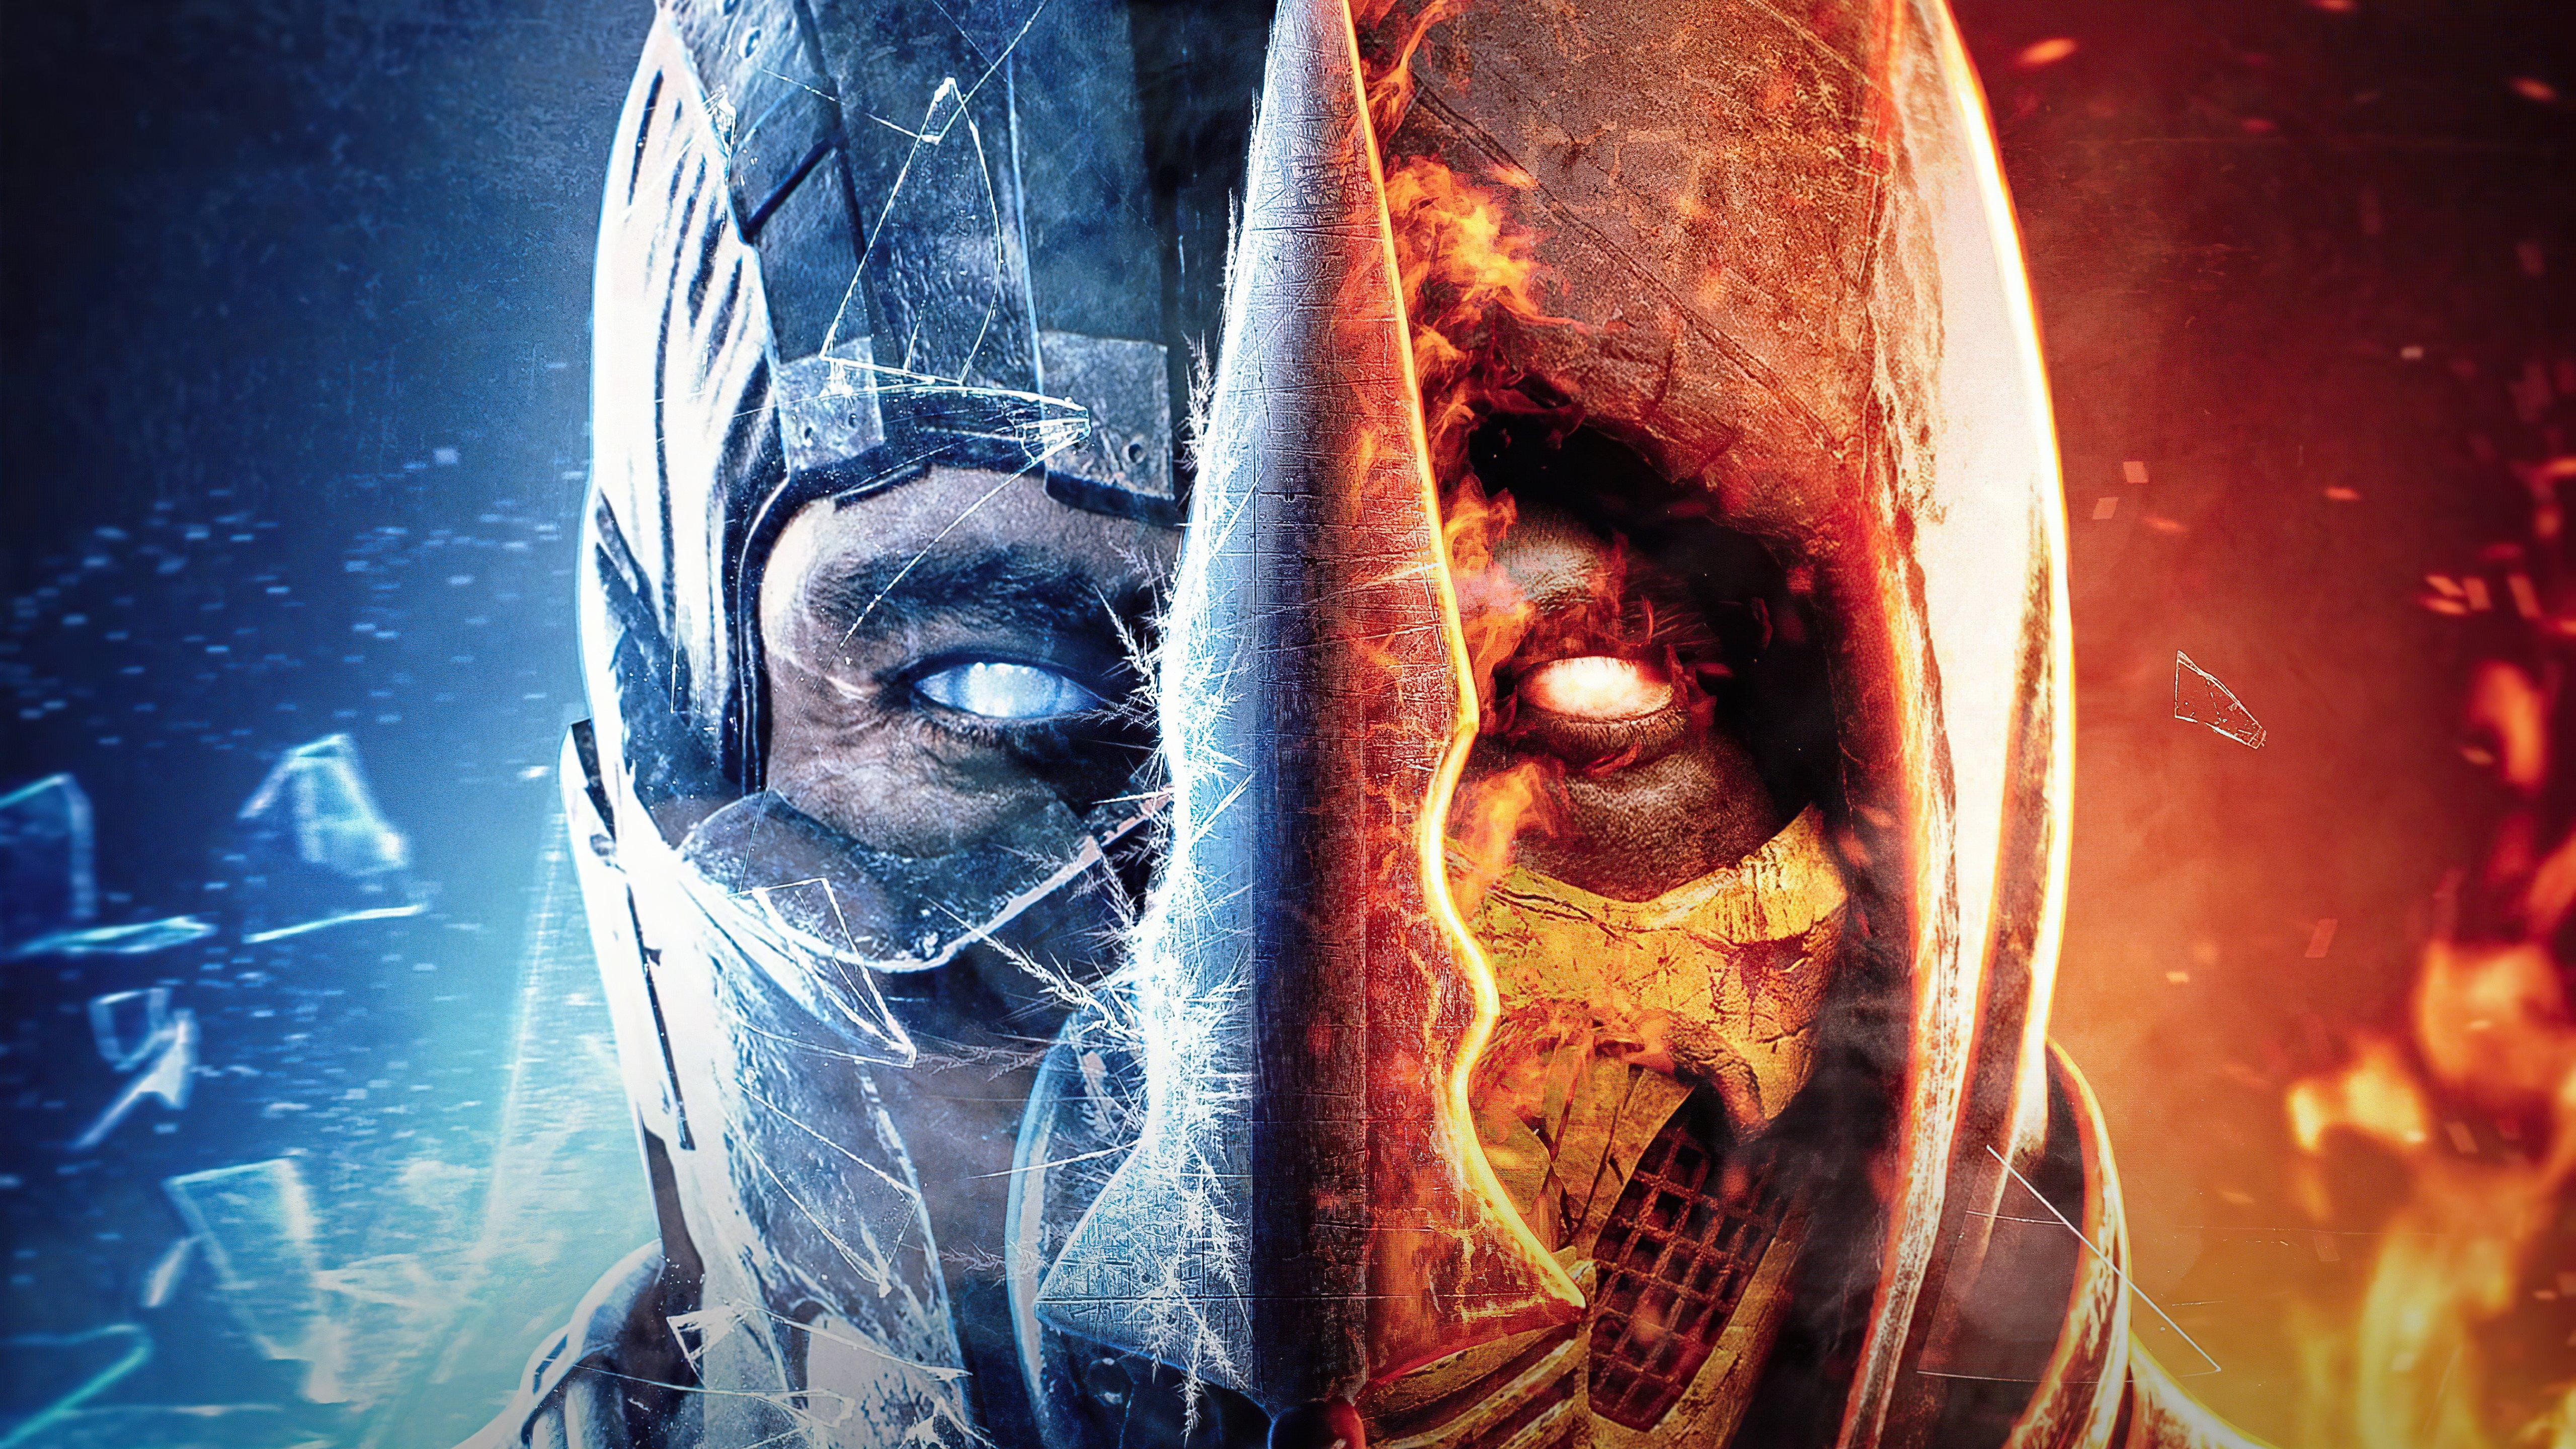 Fondos de pantalla Mortal Kombat 9